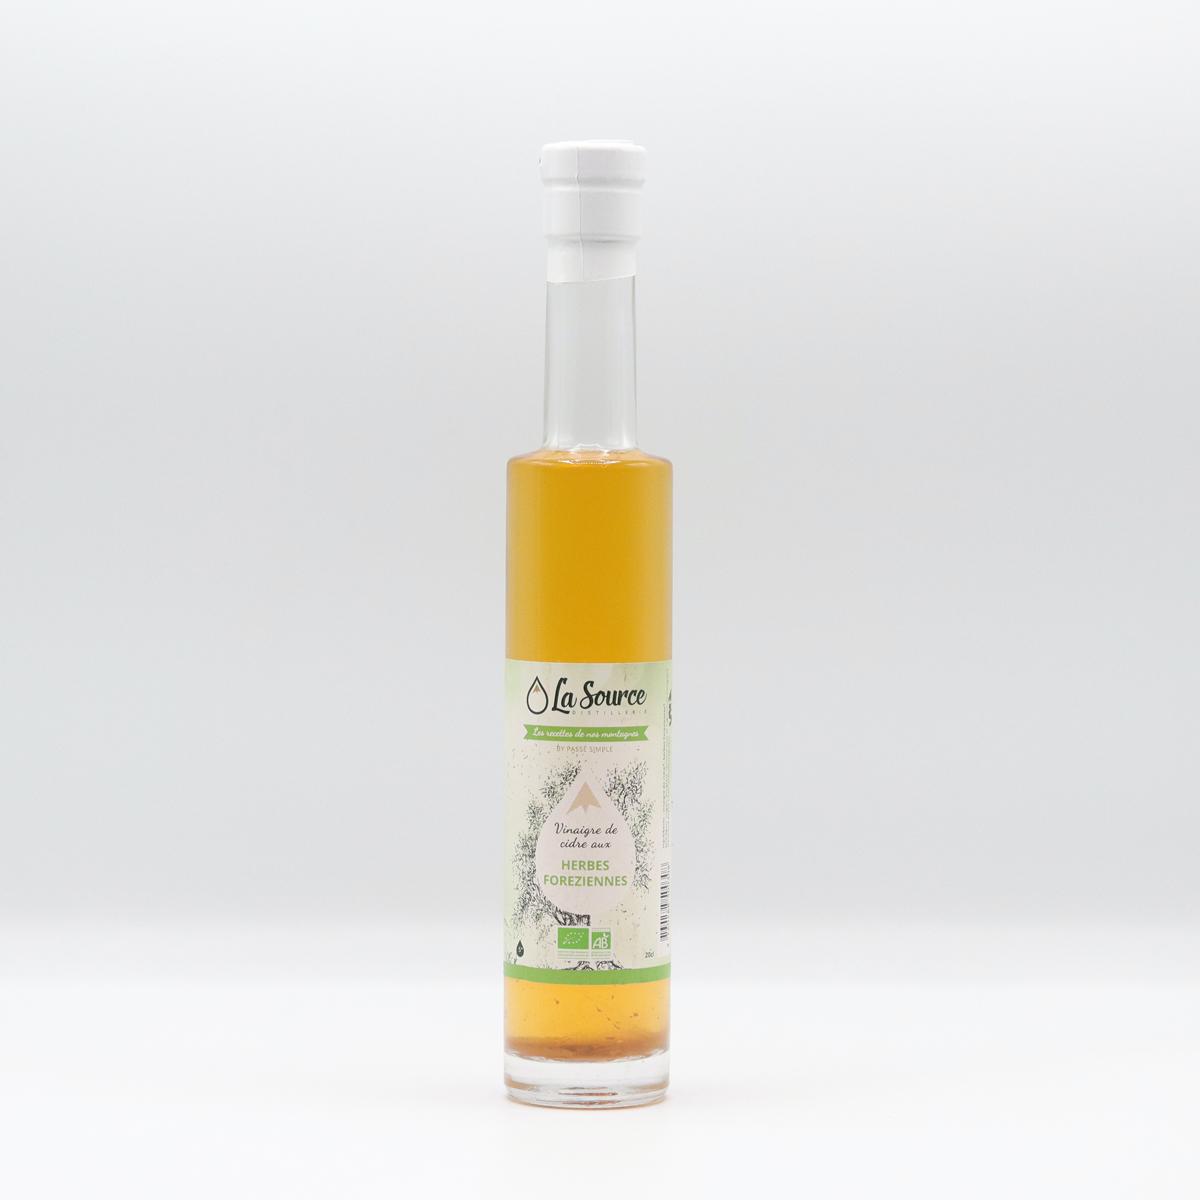 https://www.lasource-distillerie.fr/wp-content/uploads/2020/04/vinaigre-hf.jpg